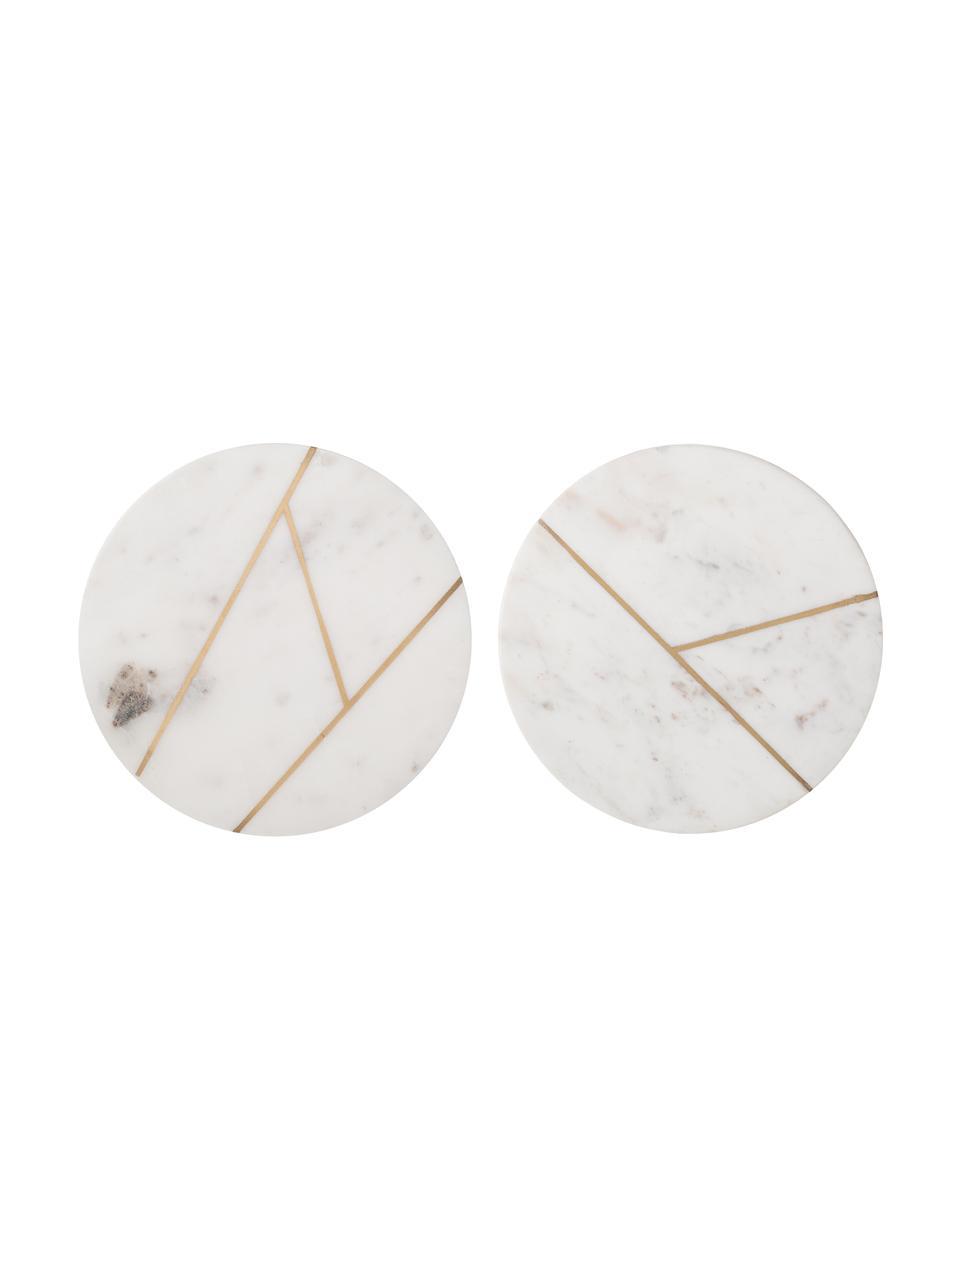 Marmorplatten-Set Marble Ø 18 cm, 2er-Set, Marmor, Weiß, marmoriert, Goldfarben, Ø 18 cm